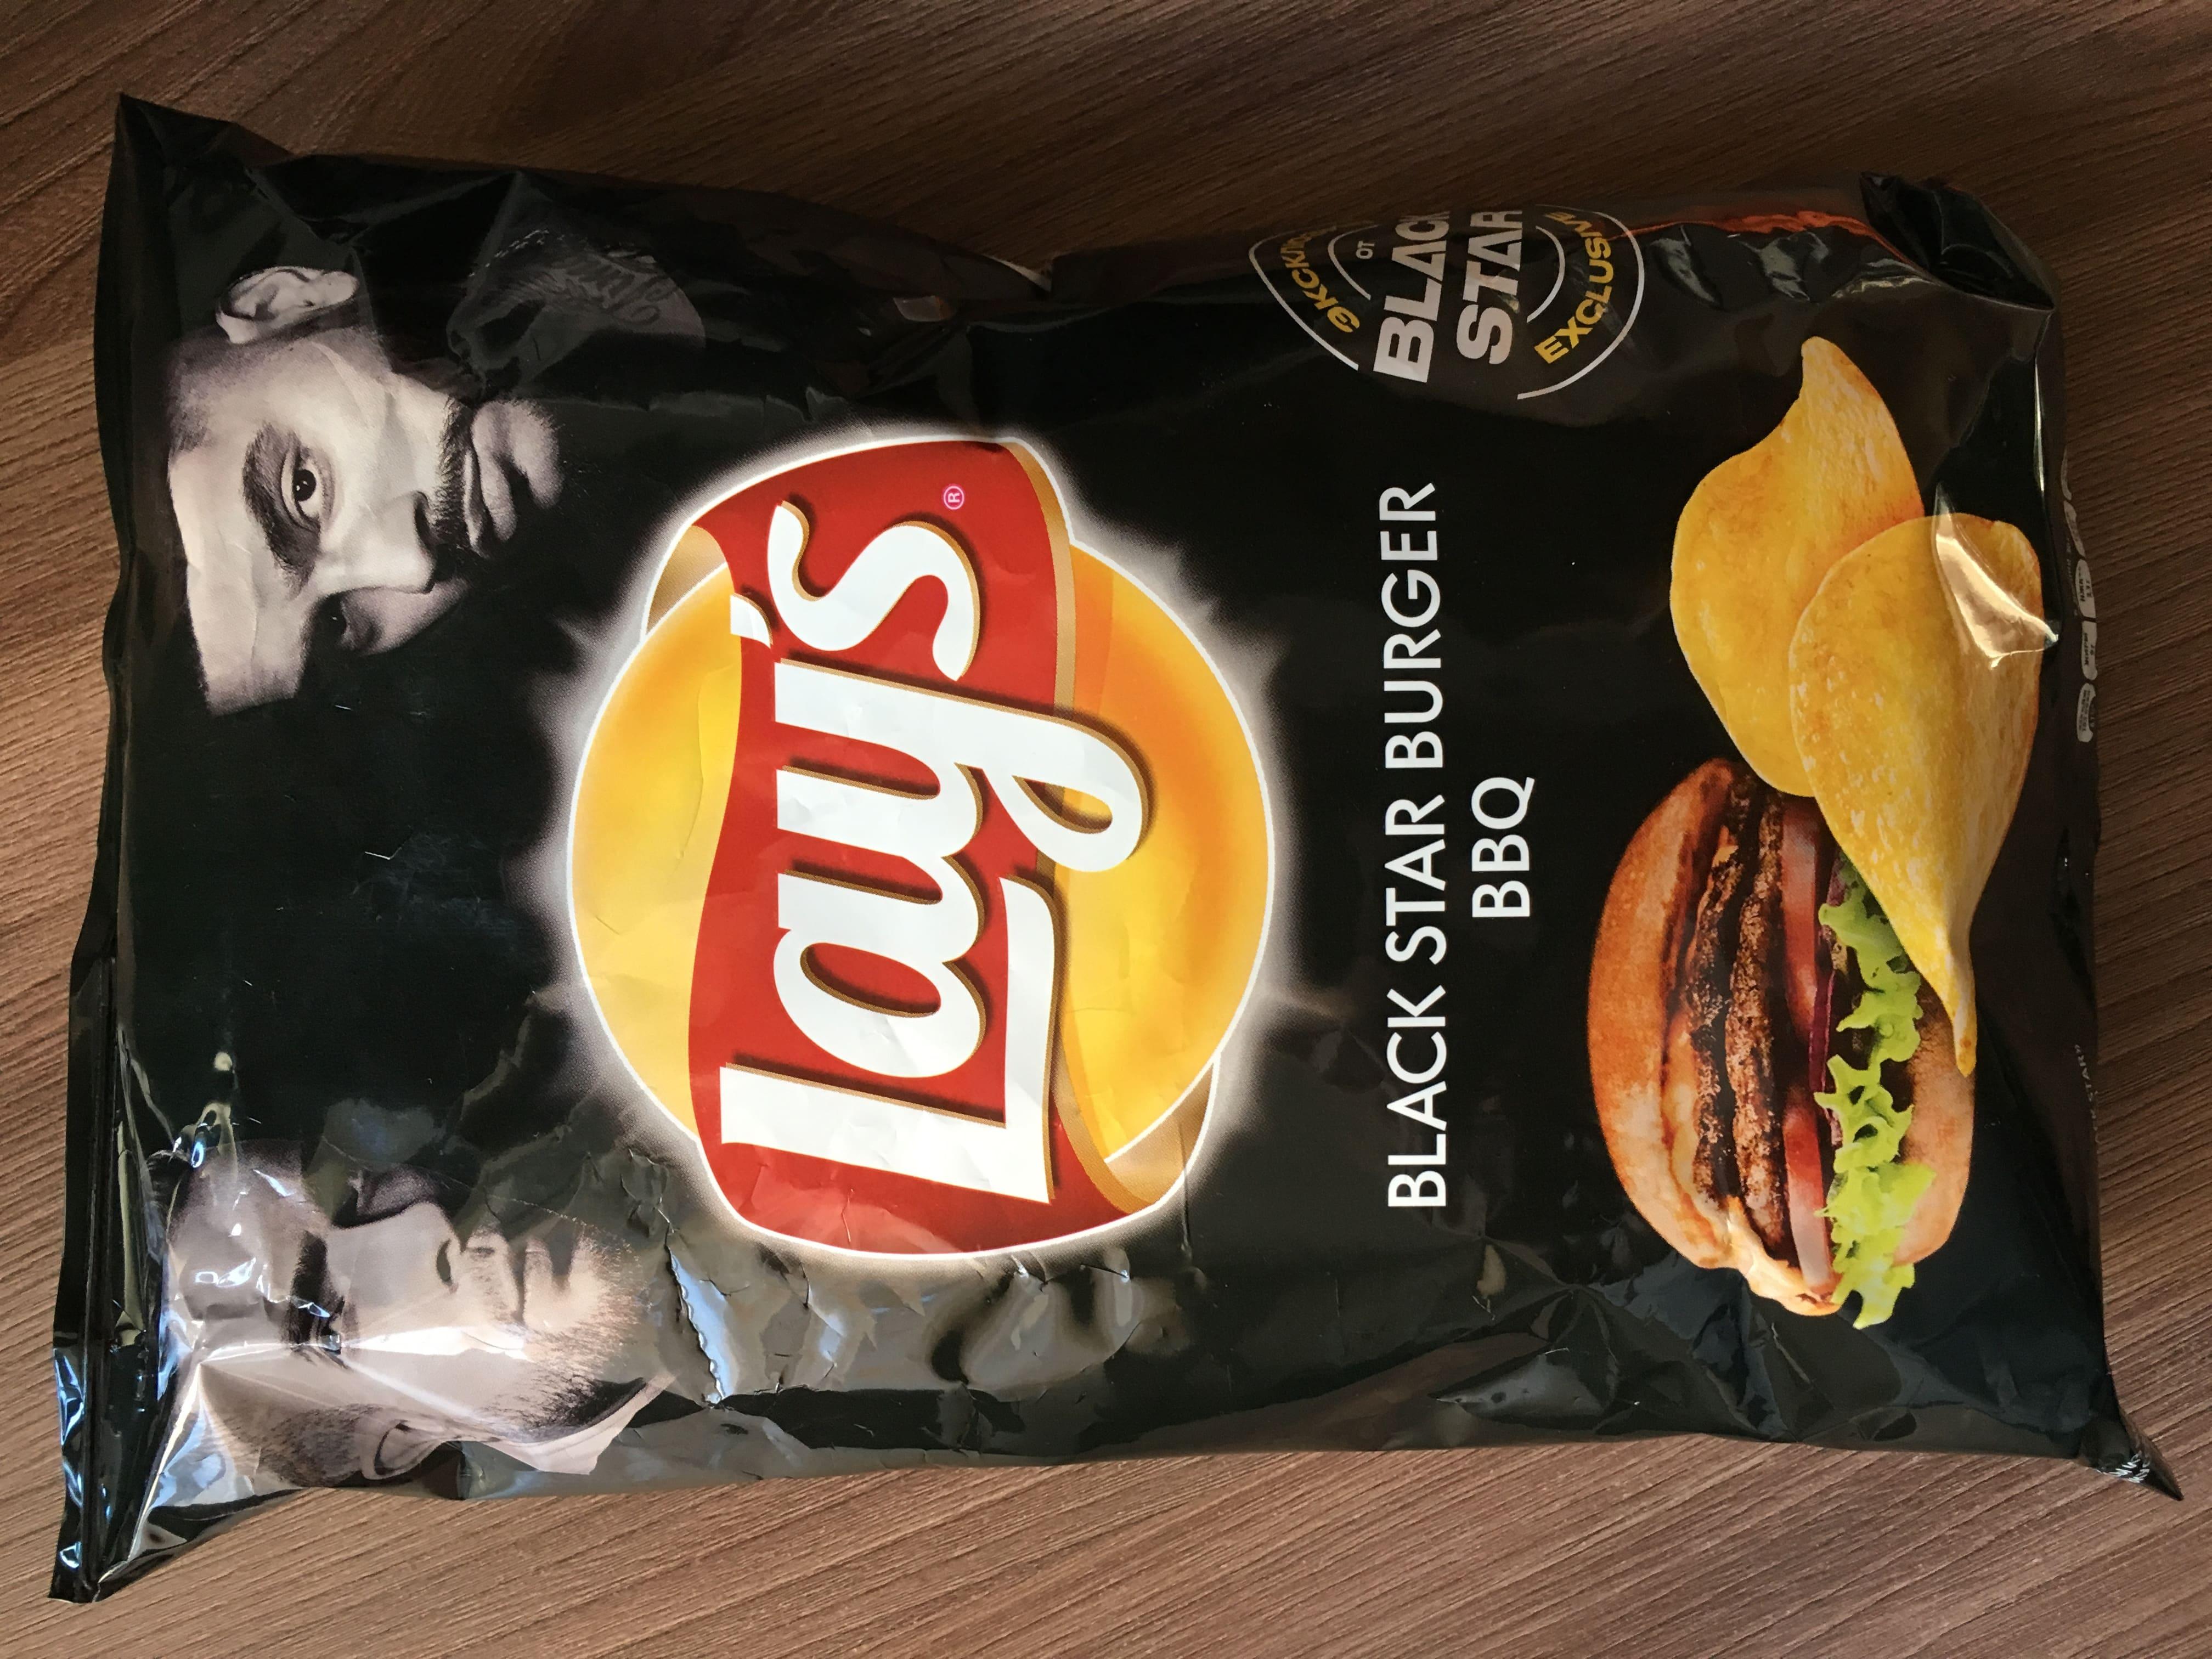 Lays Black Star со вкусом Burger BBQ